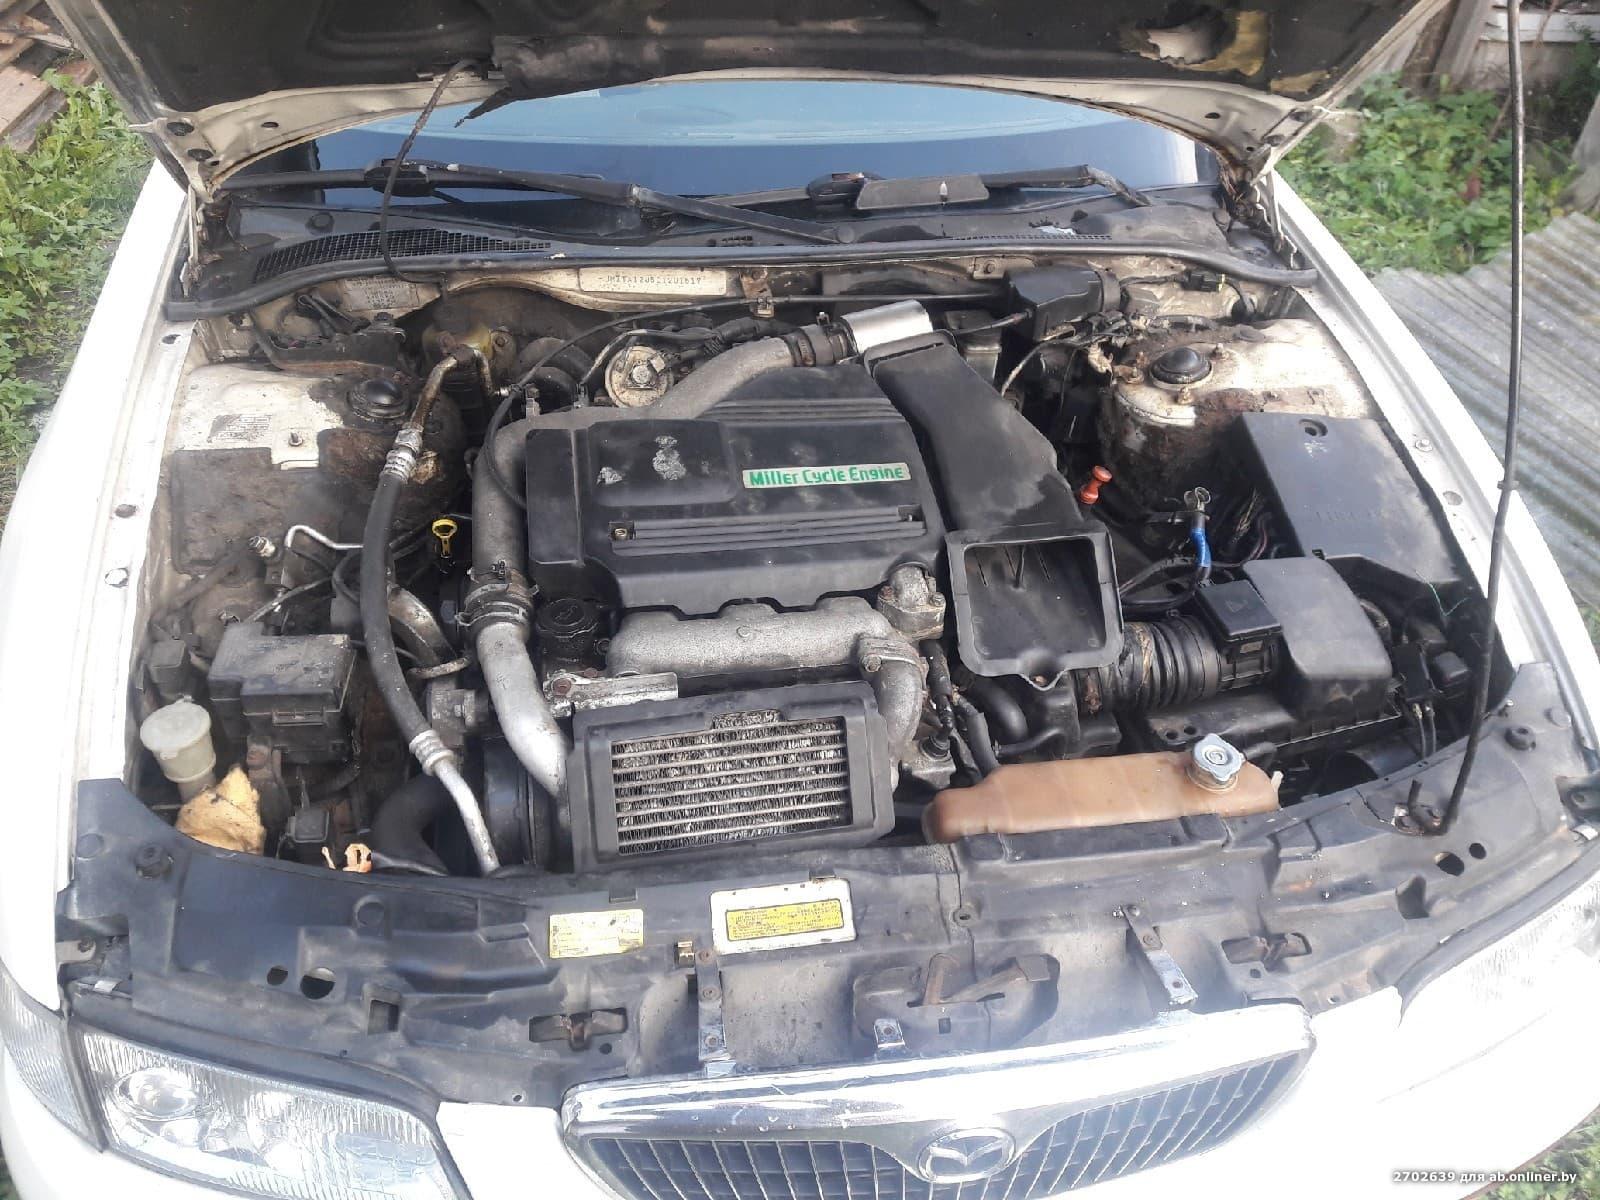 Mazda Xedos 9 2.3 kompressor